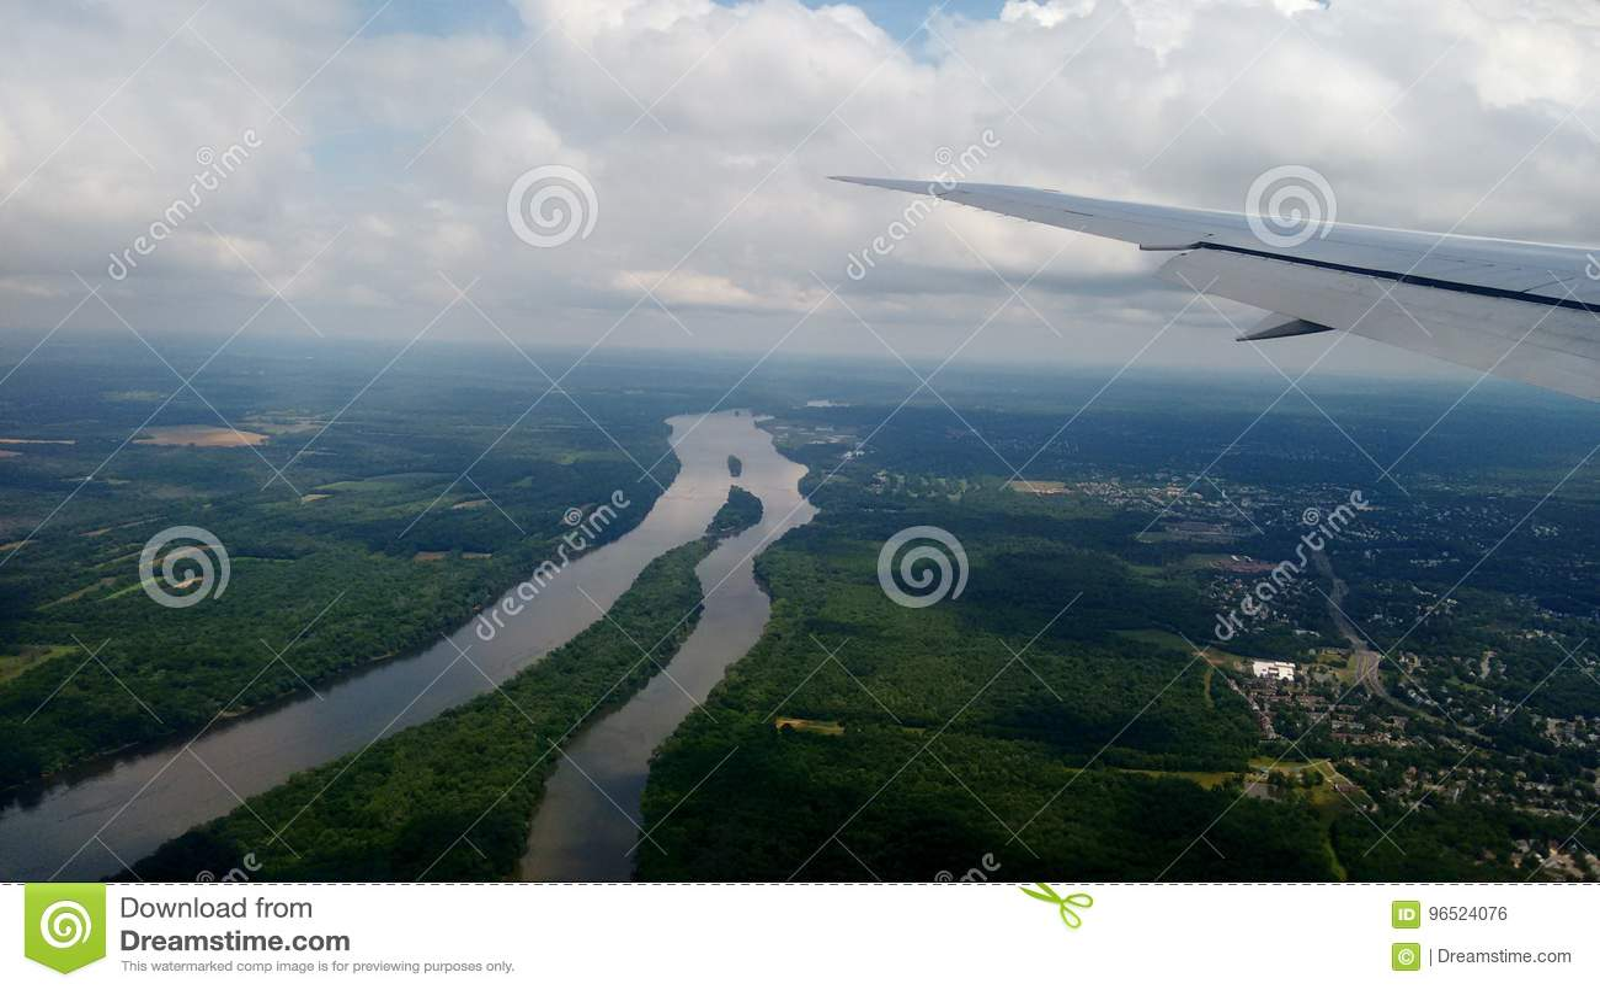 Washington from the plane